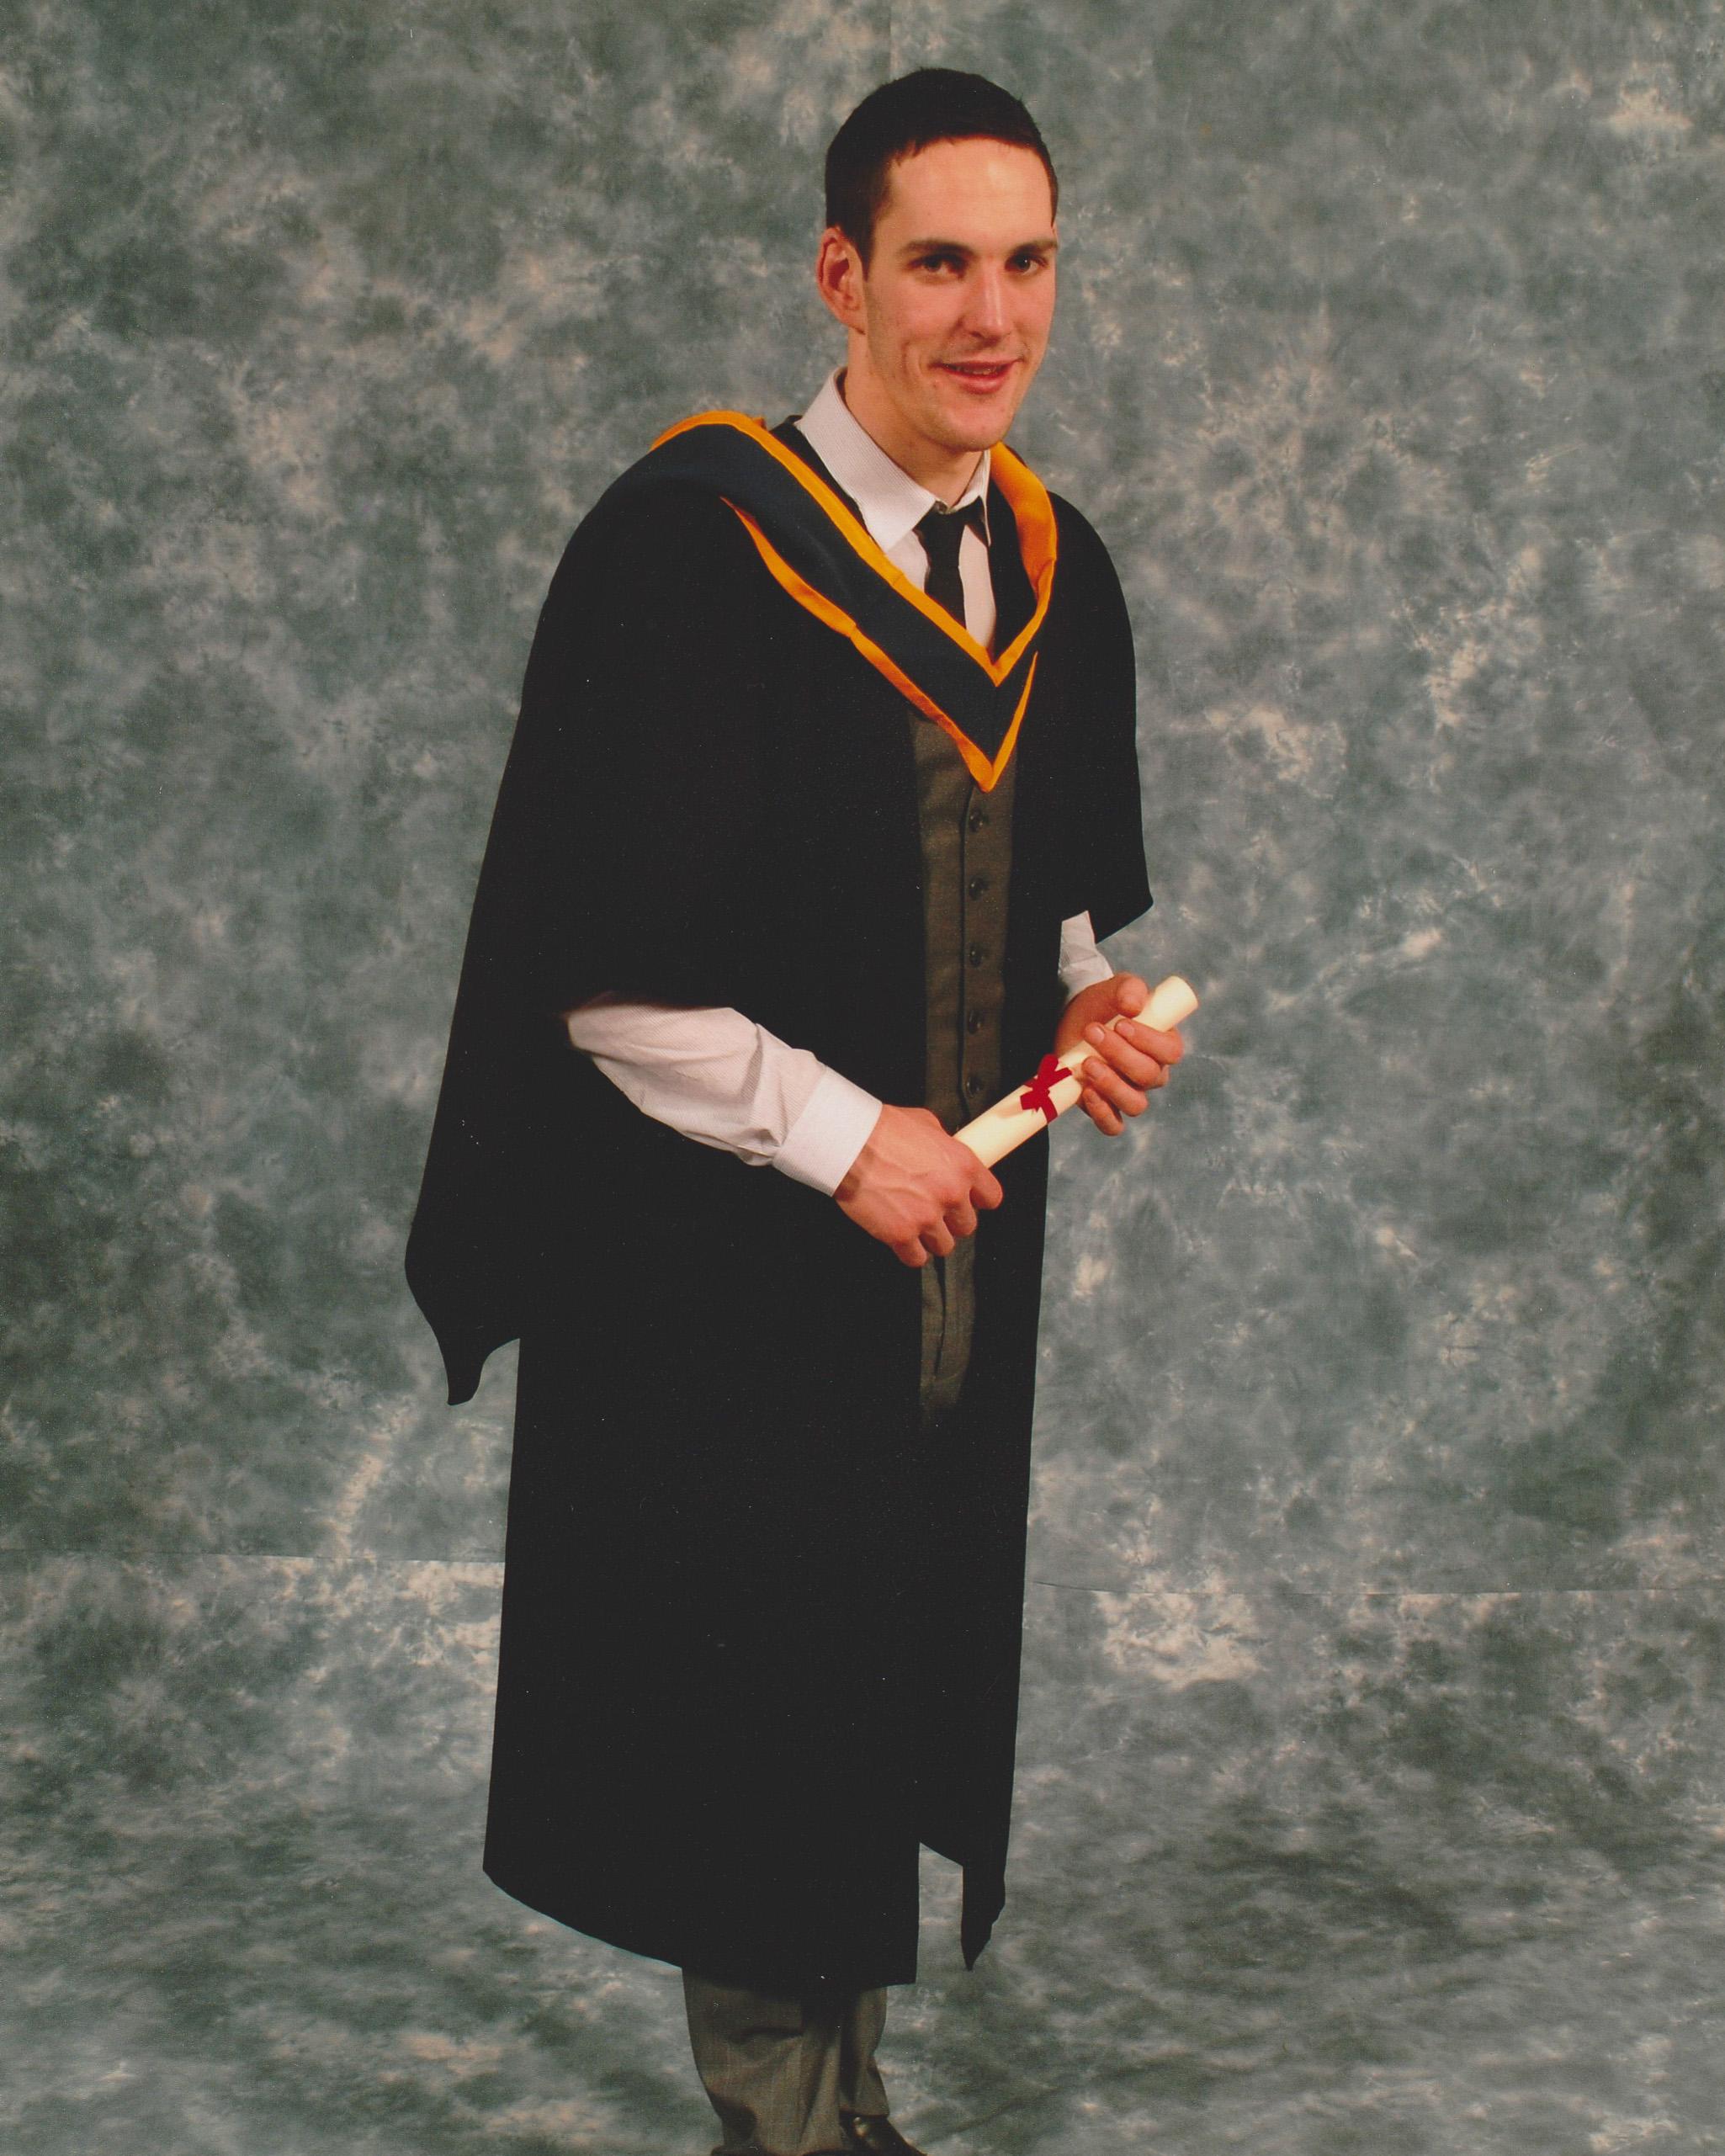 paul-graduates-as-furniture-design-and-manufacturer-maker-gents.jpg